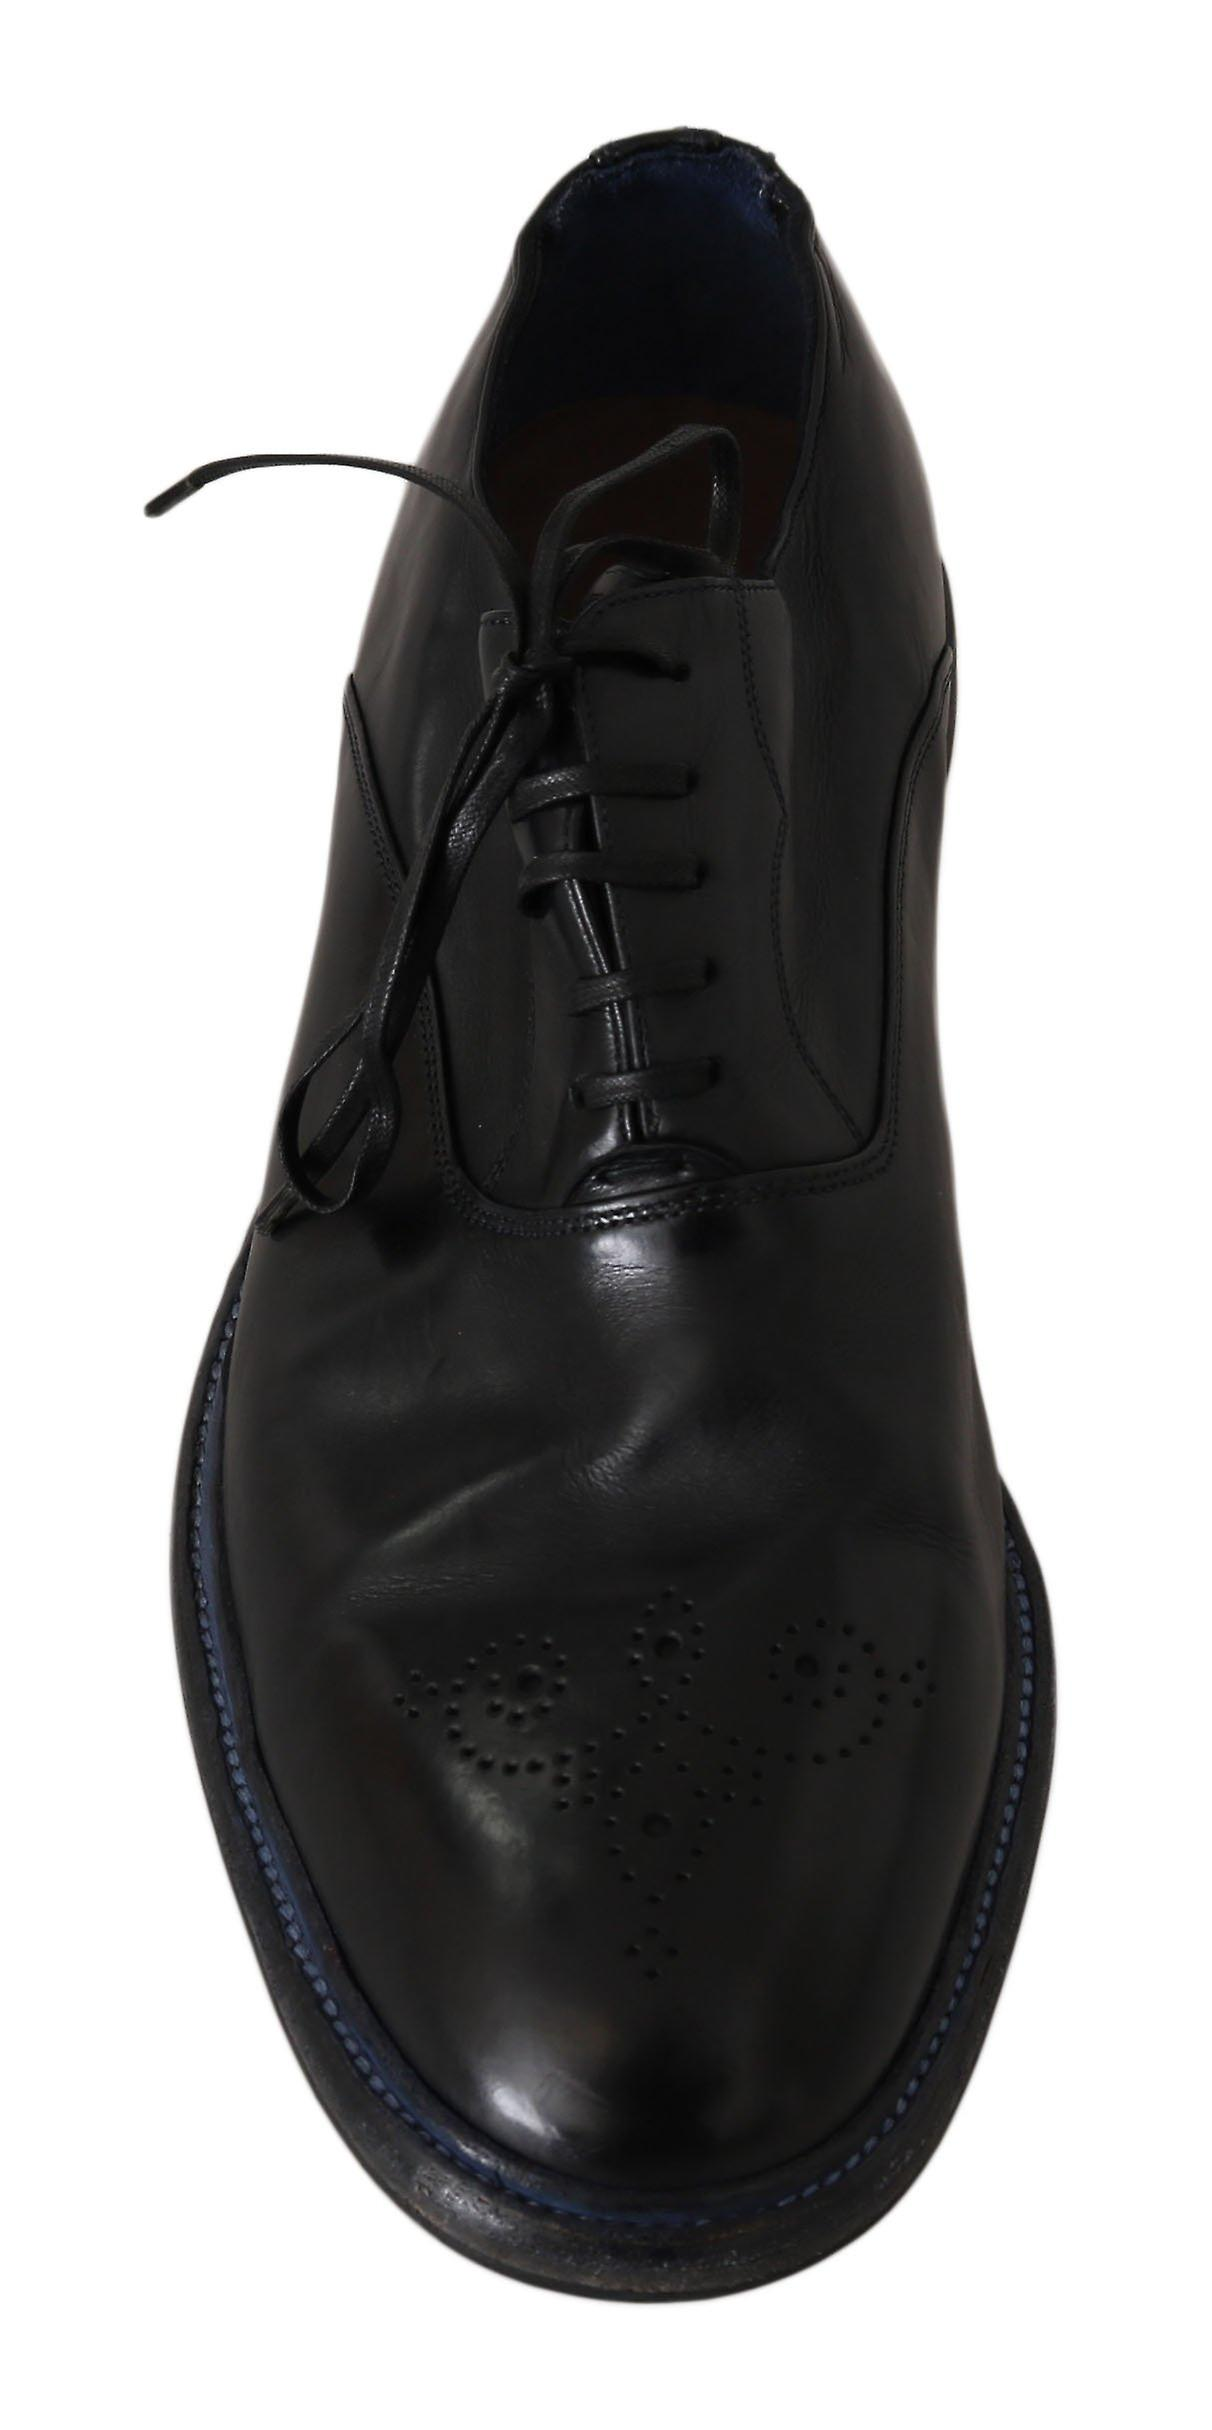 Dolce & Gabbana Black Leather Derby Brogue Dress Shoes MV2408-45